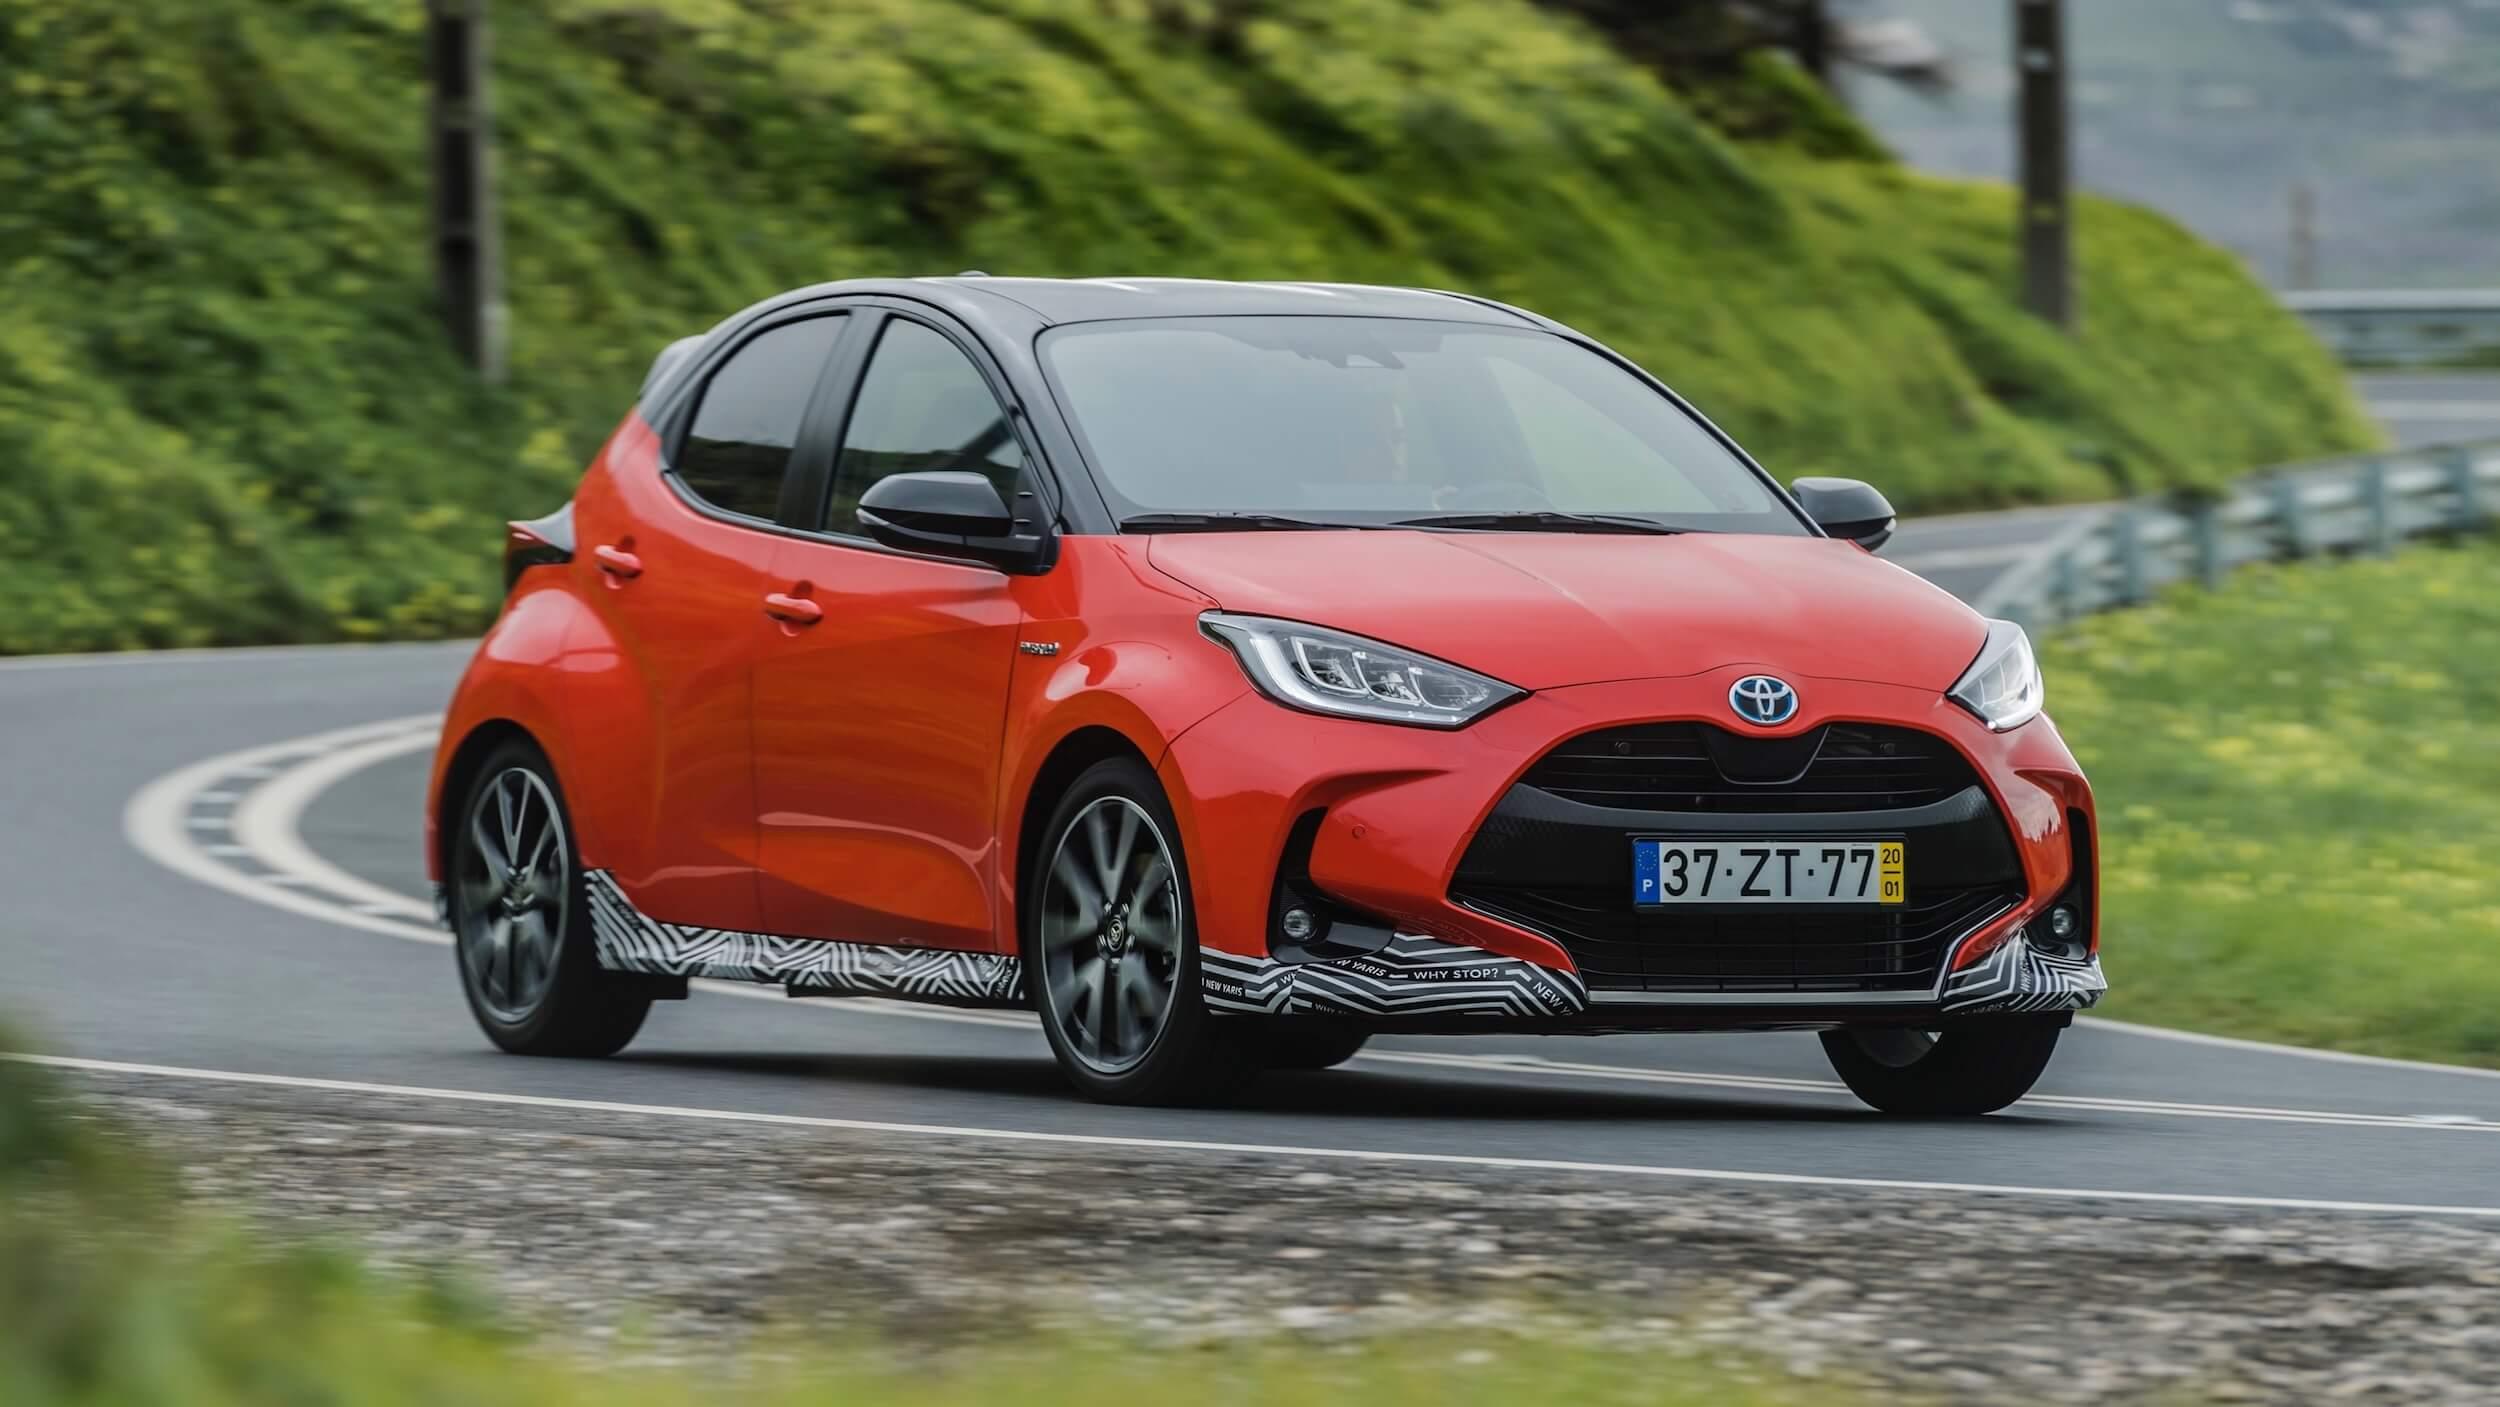 novo Toyota Yaris híbrido